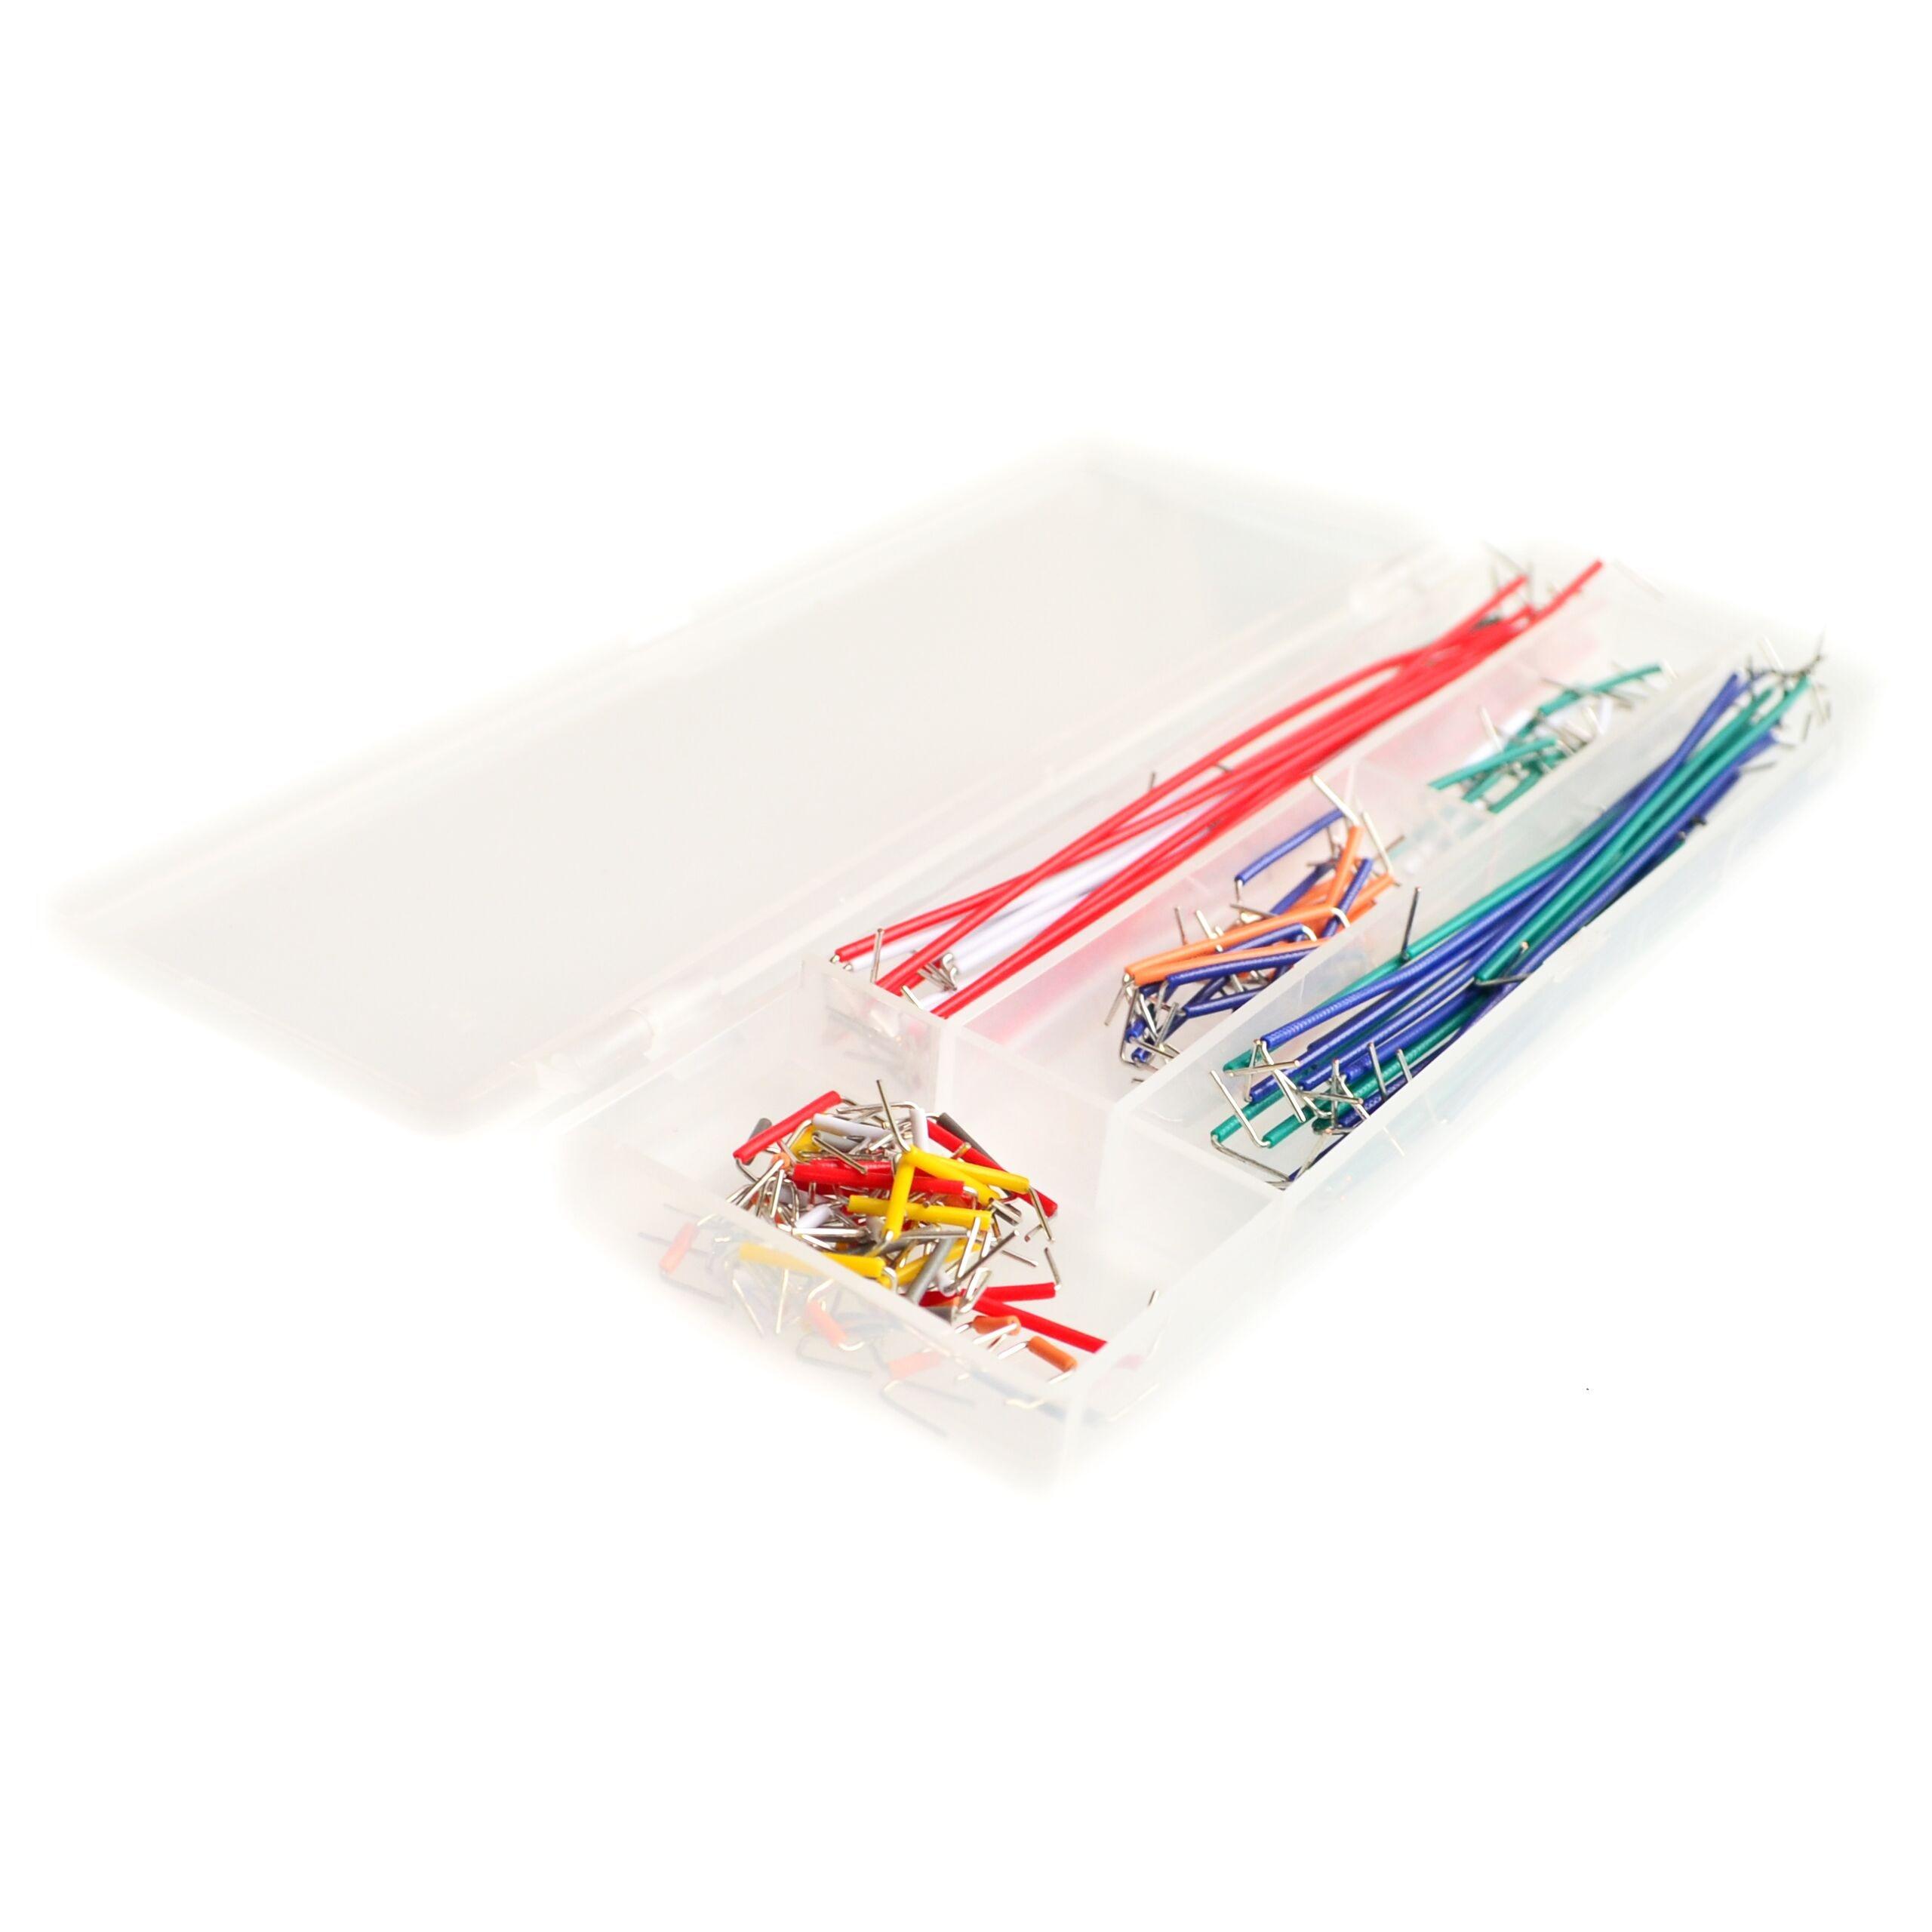 5Pcs/lot 140 pcs U Shape Solderless Breadboard Jumper Cable Wire Kit For Arduino Shield For raspberry pi